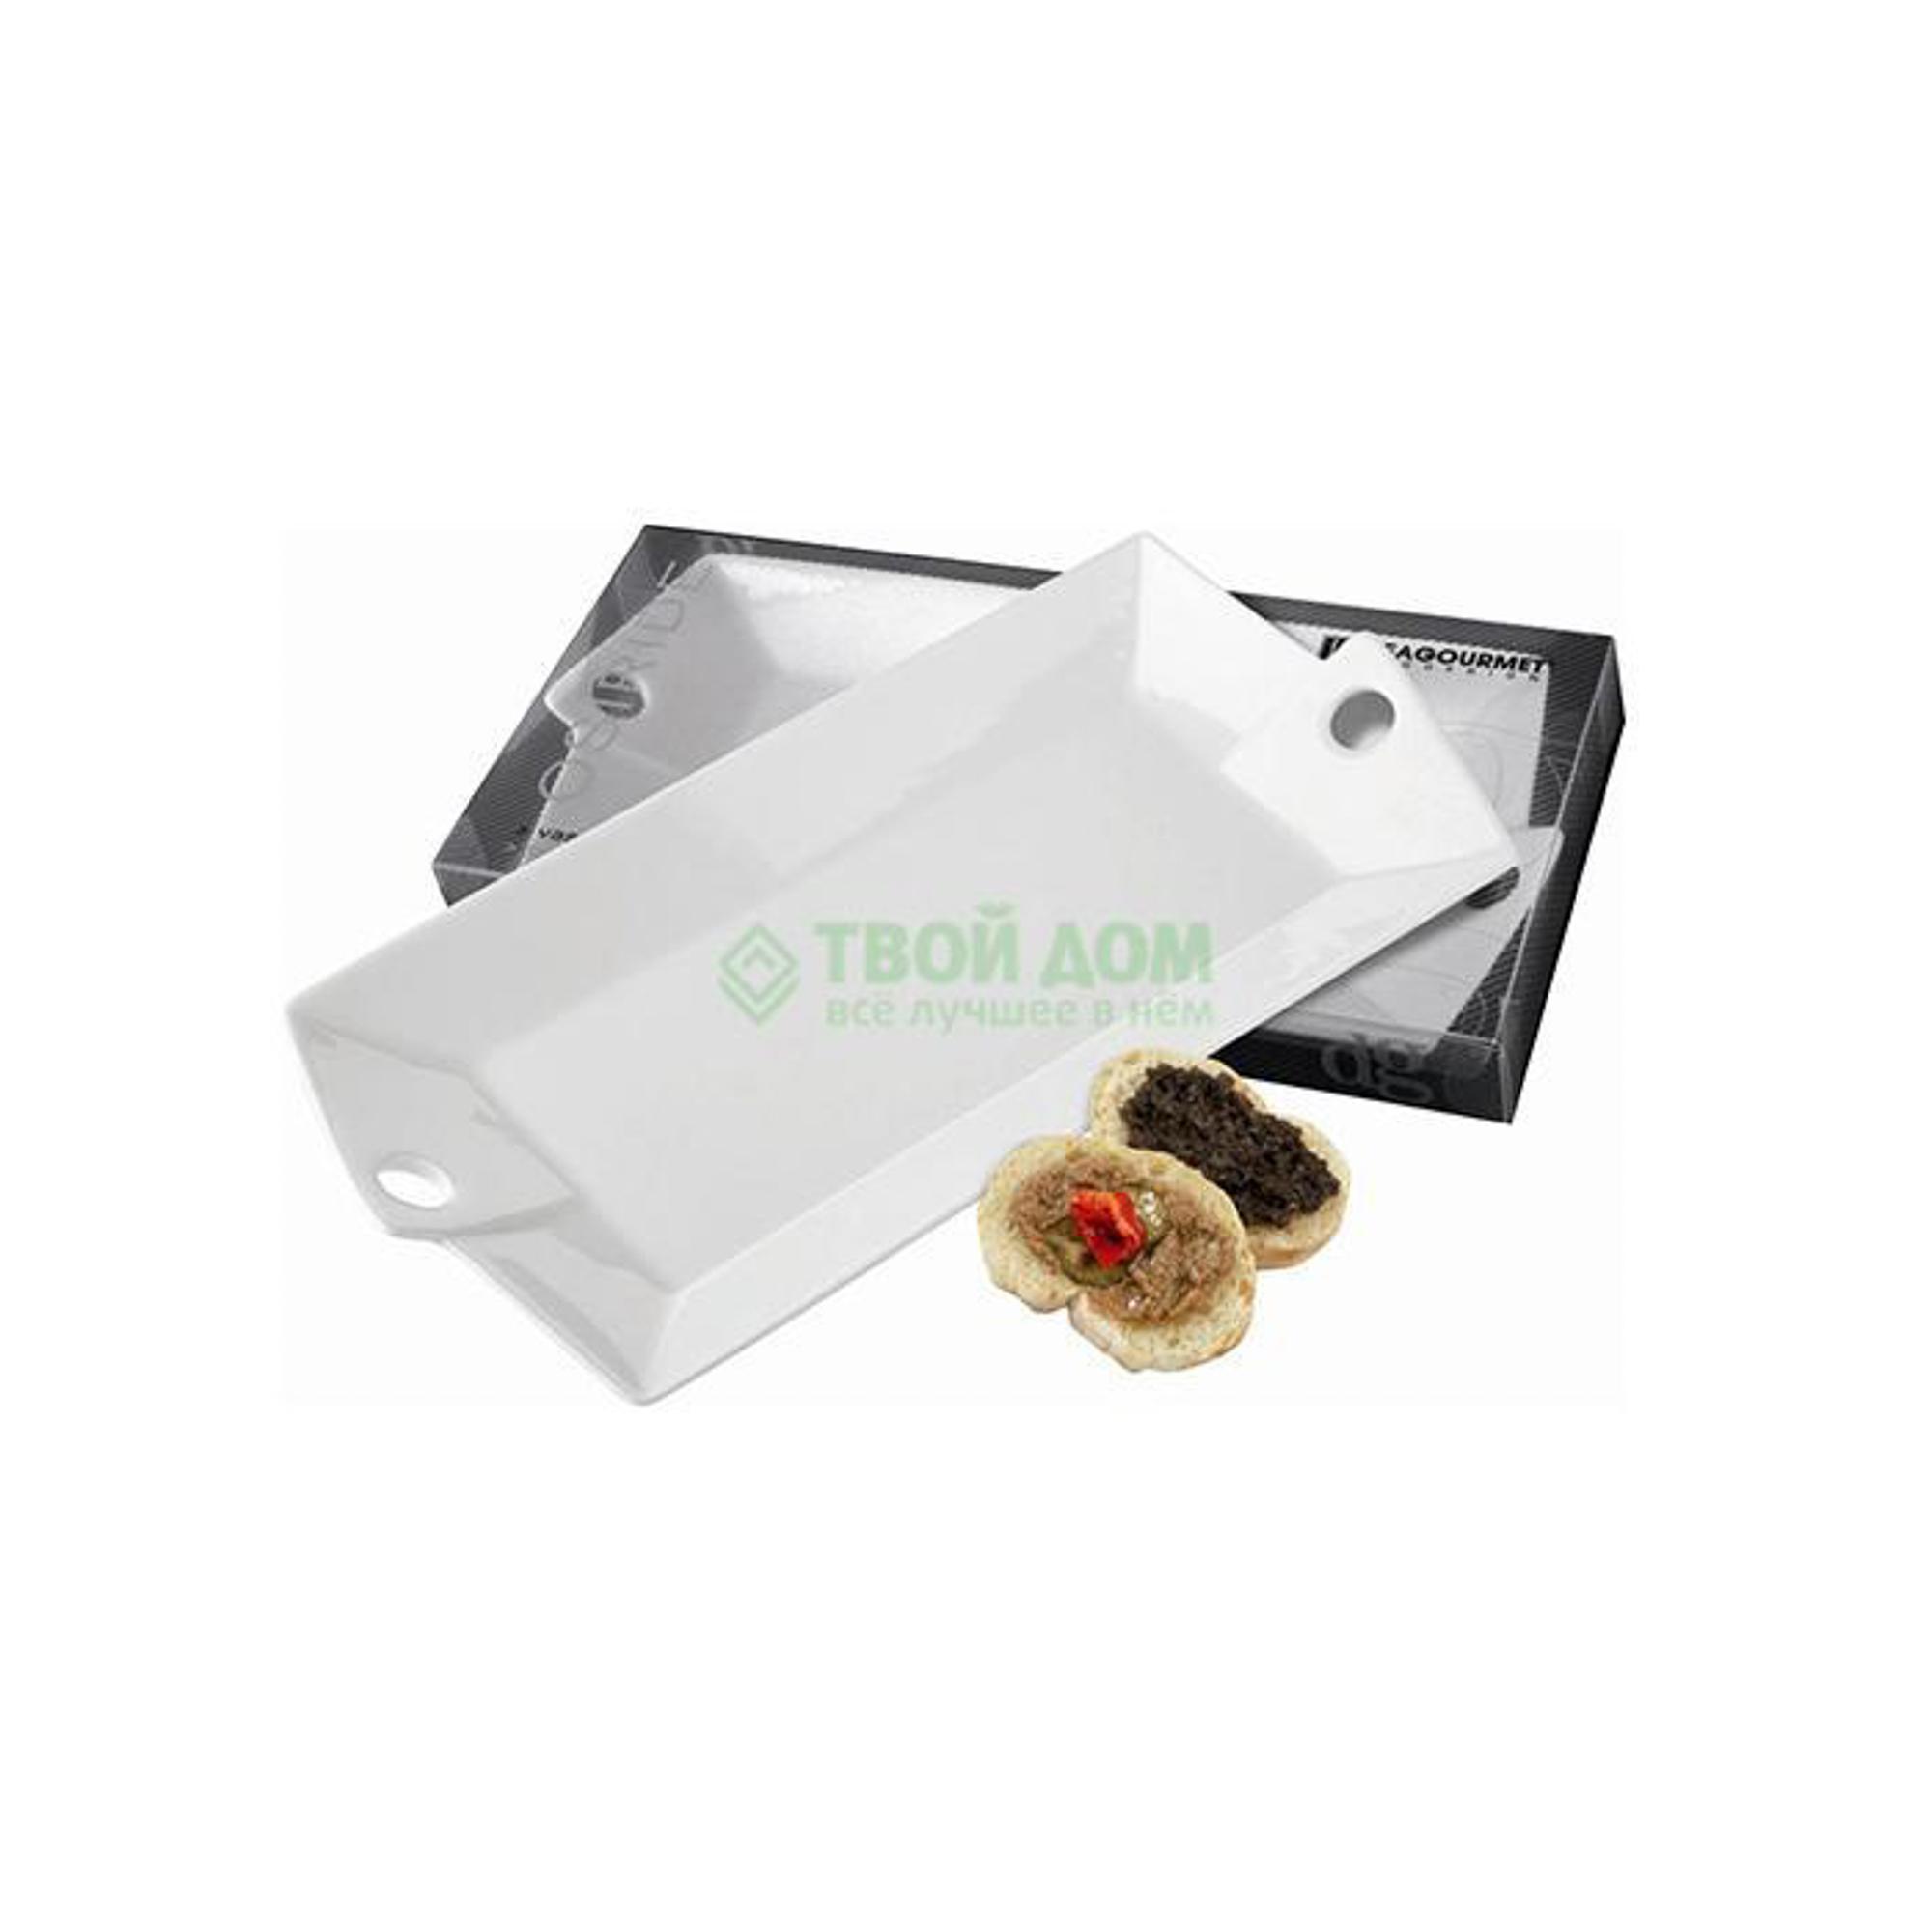 Блюдо DeaGourmet Osiride 25.5 х 12.5 см